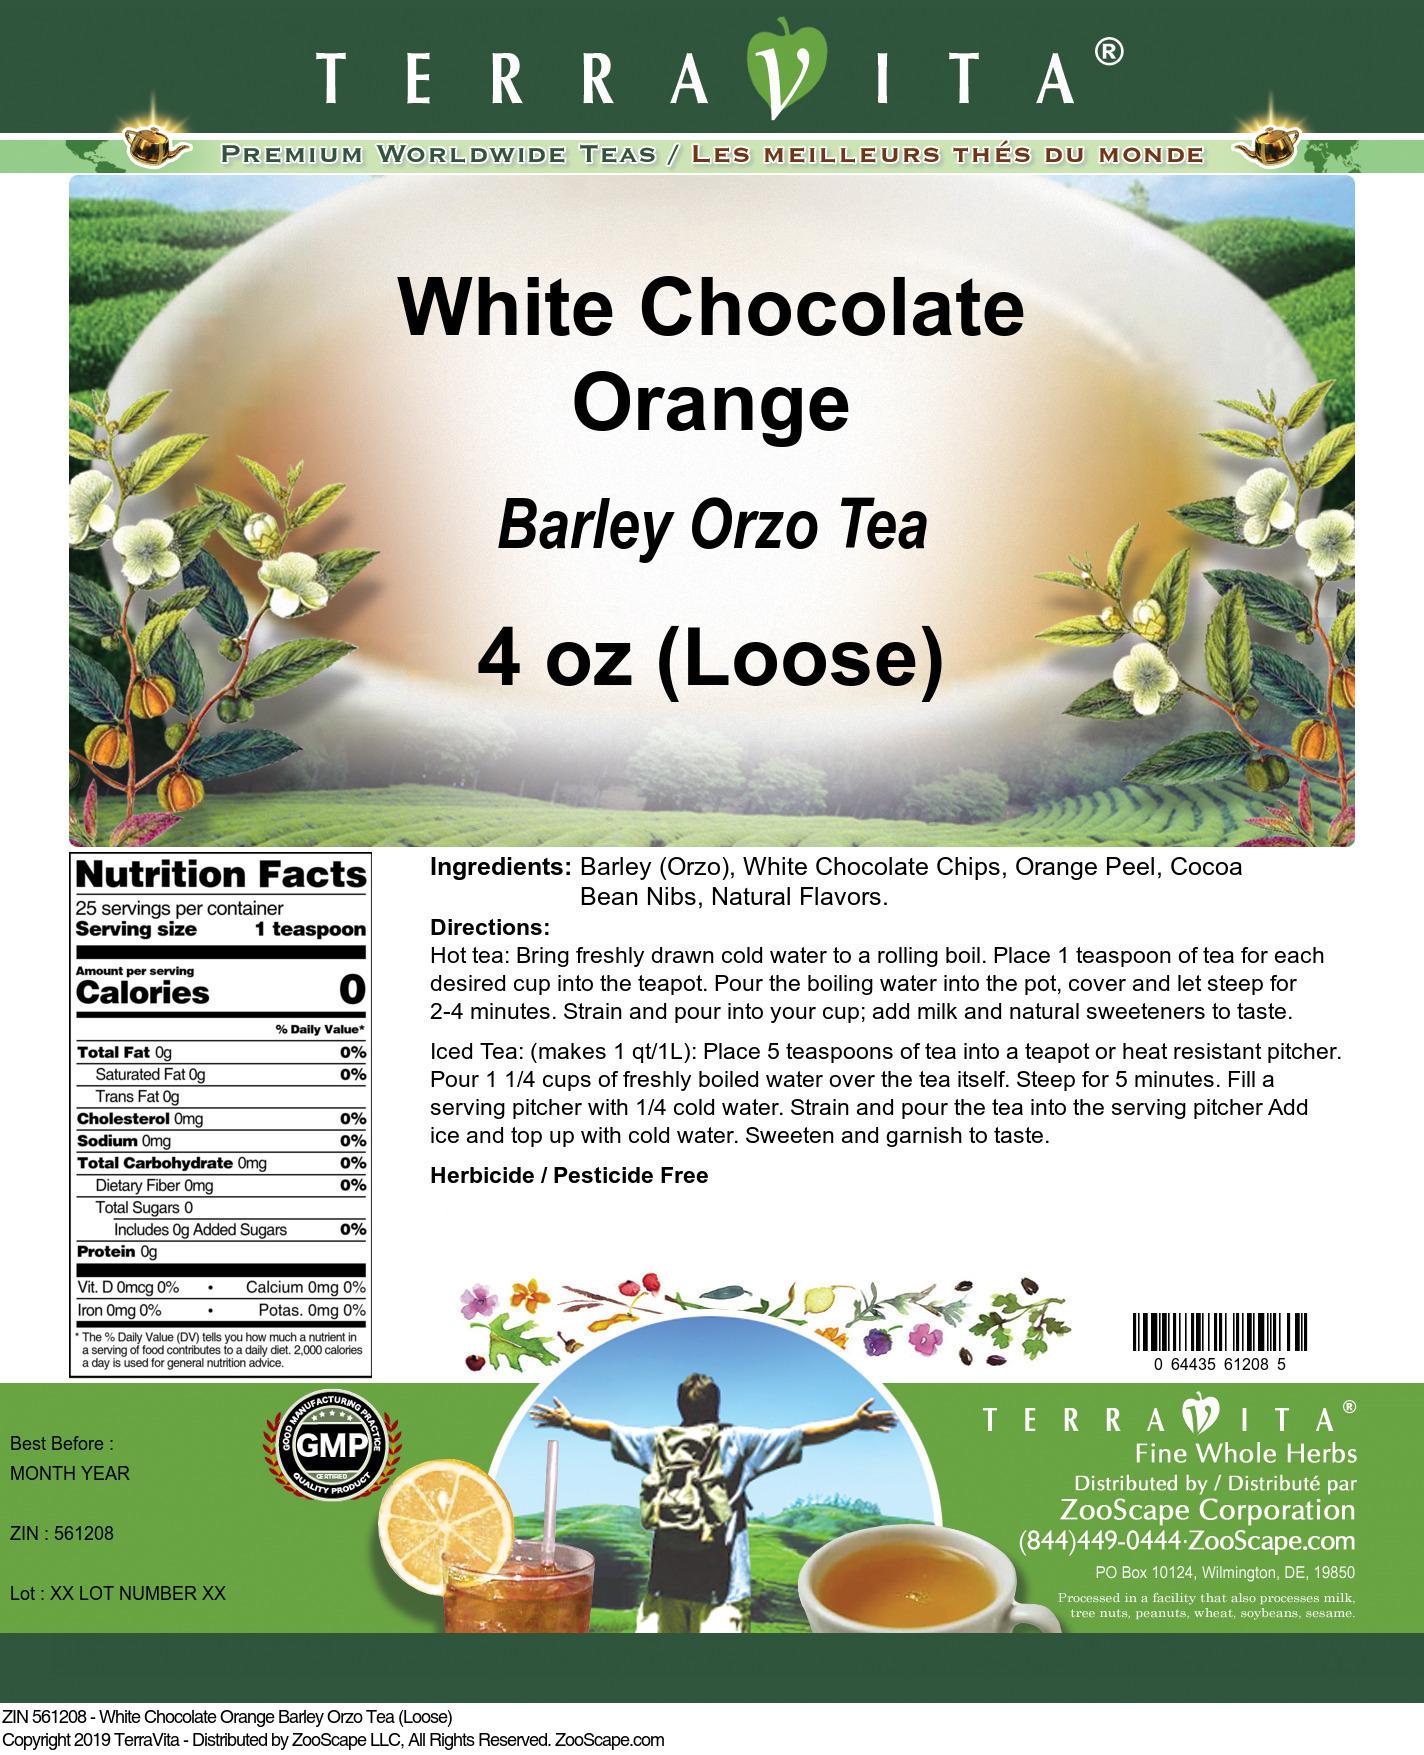 White Chocolate Orange Barley Orzo